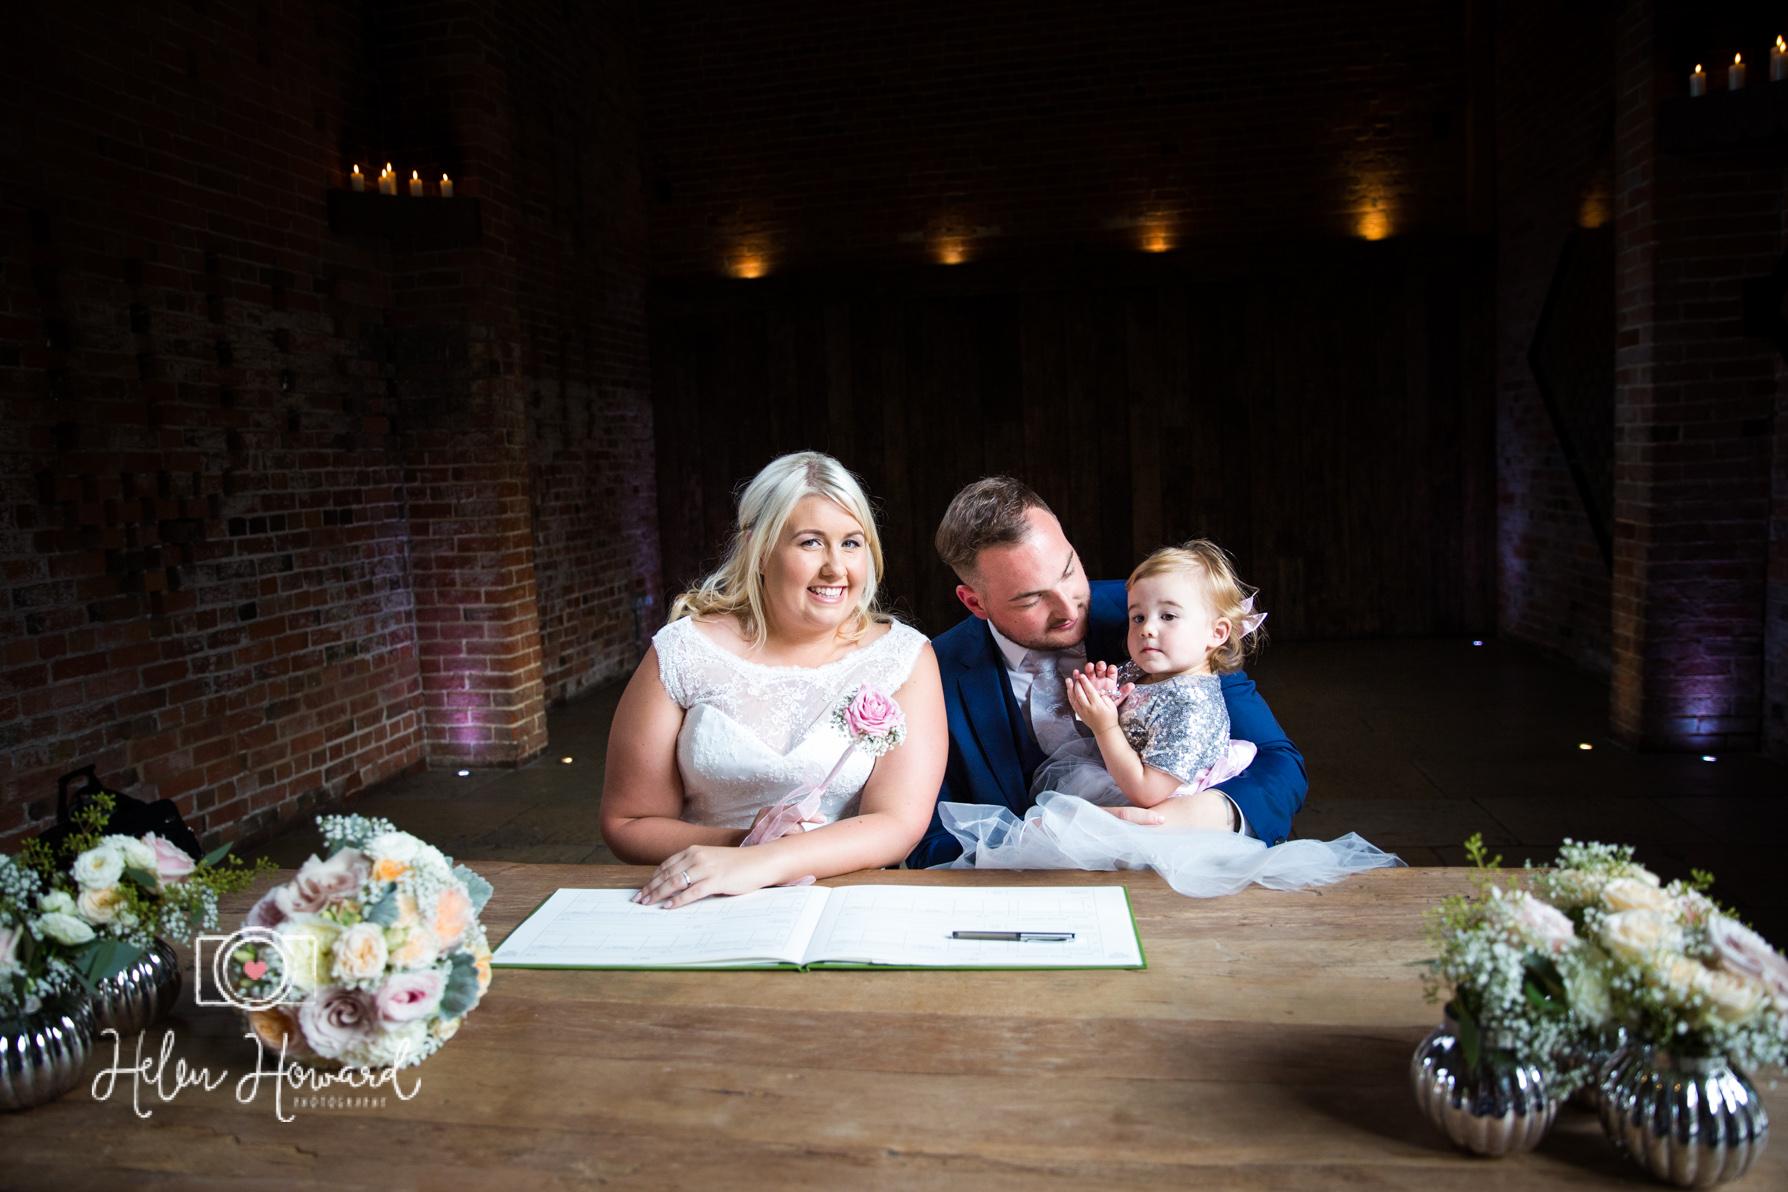 Shustoke Farm Barns Wedding Photography by Helen Howard-20.jpg